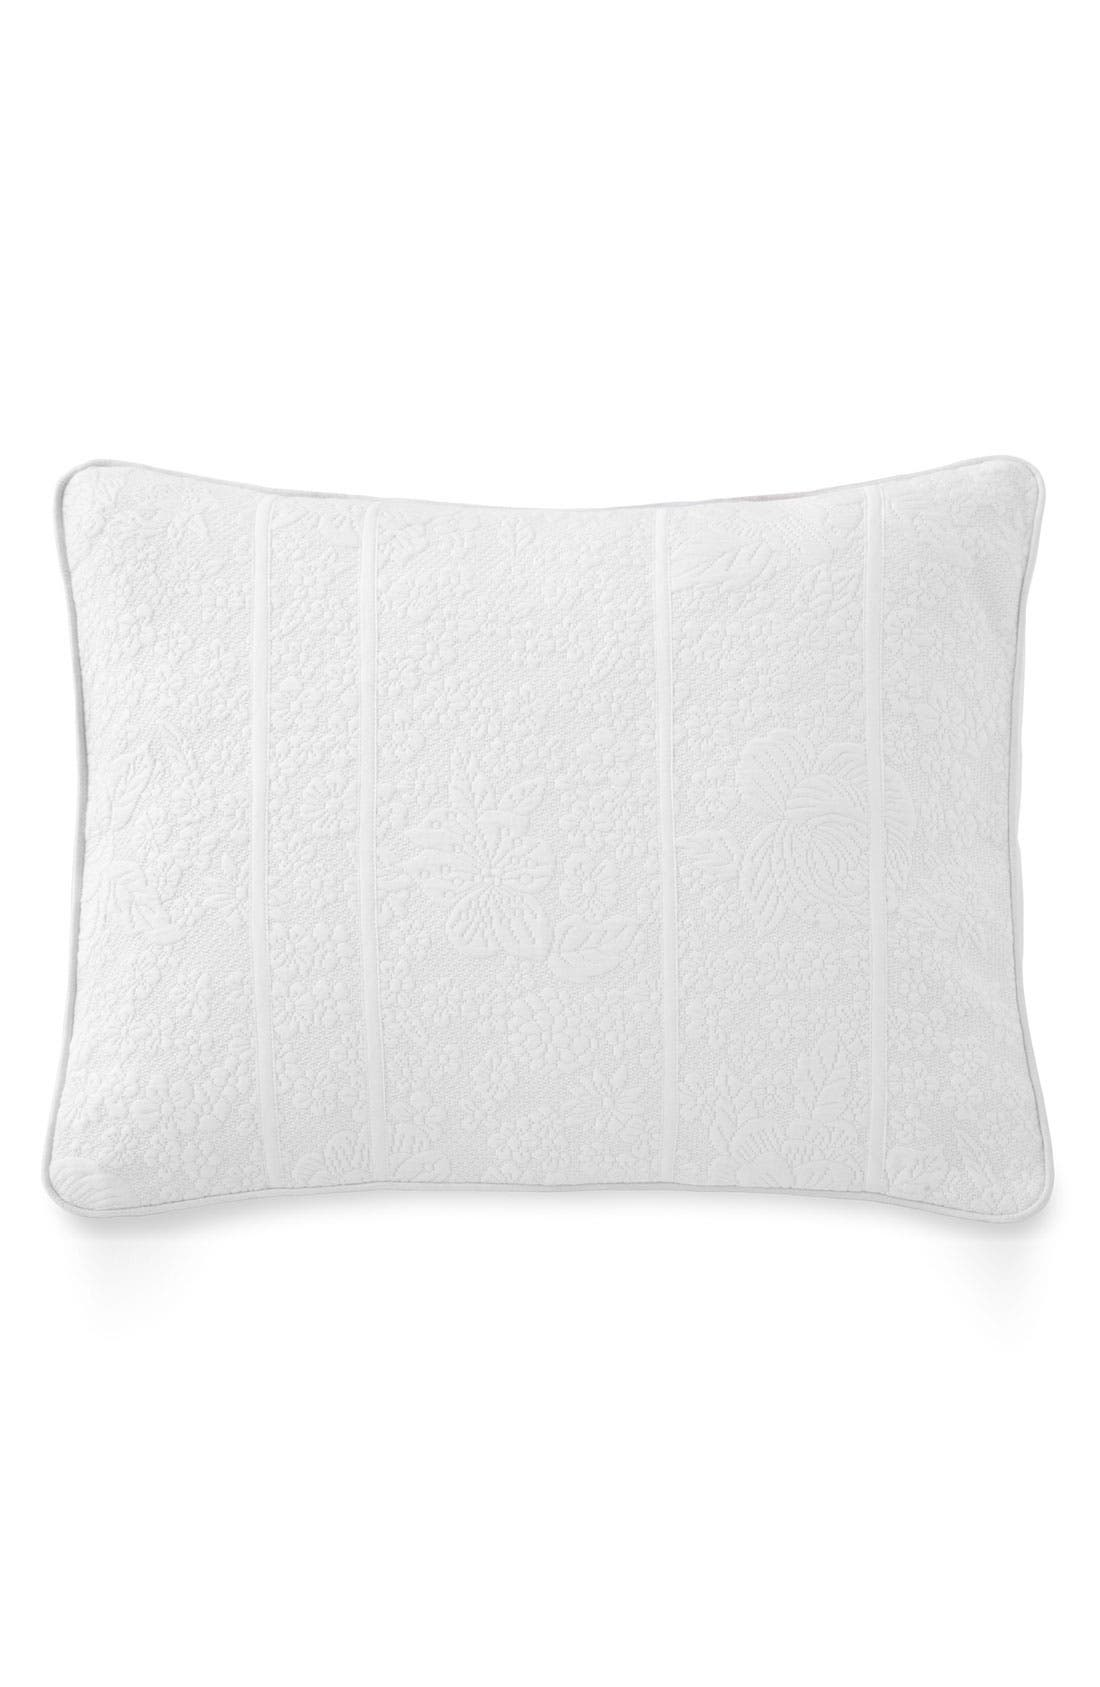 Alternate Image 1 Selected - DKNY 'Pure Innocence' Pillow Sham